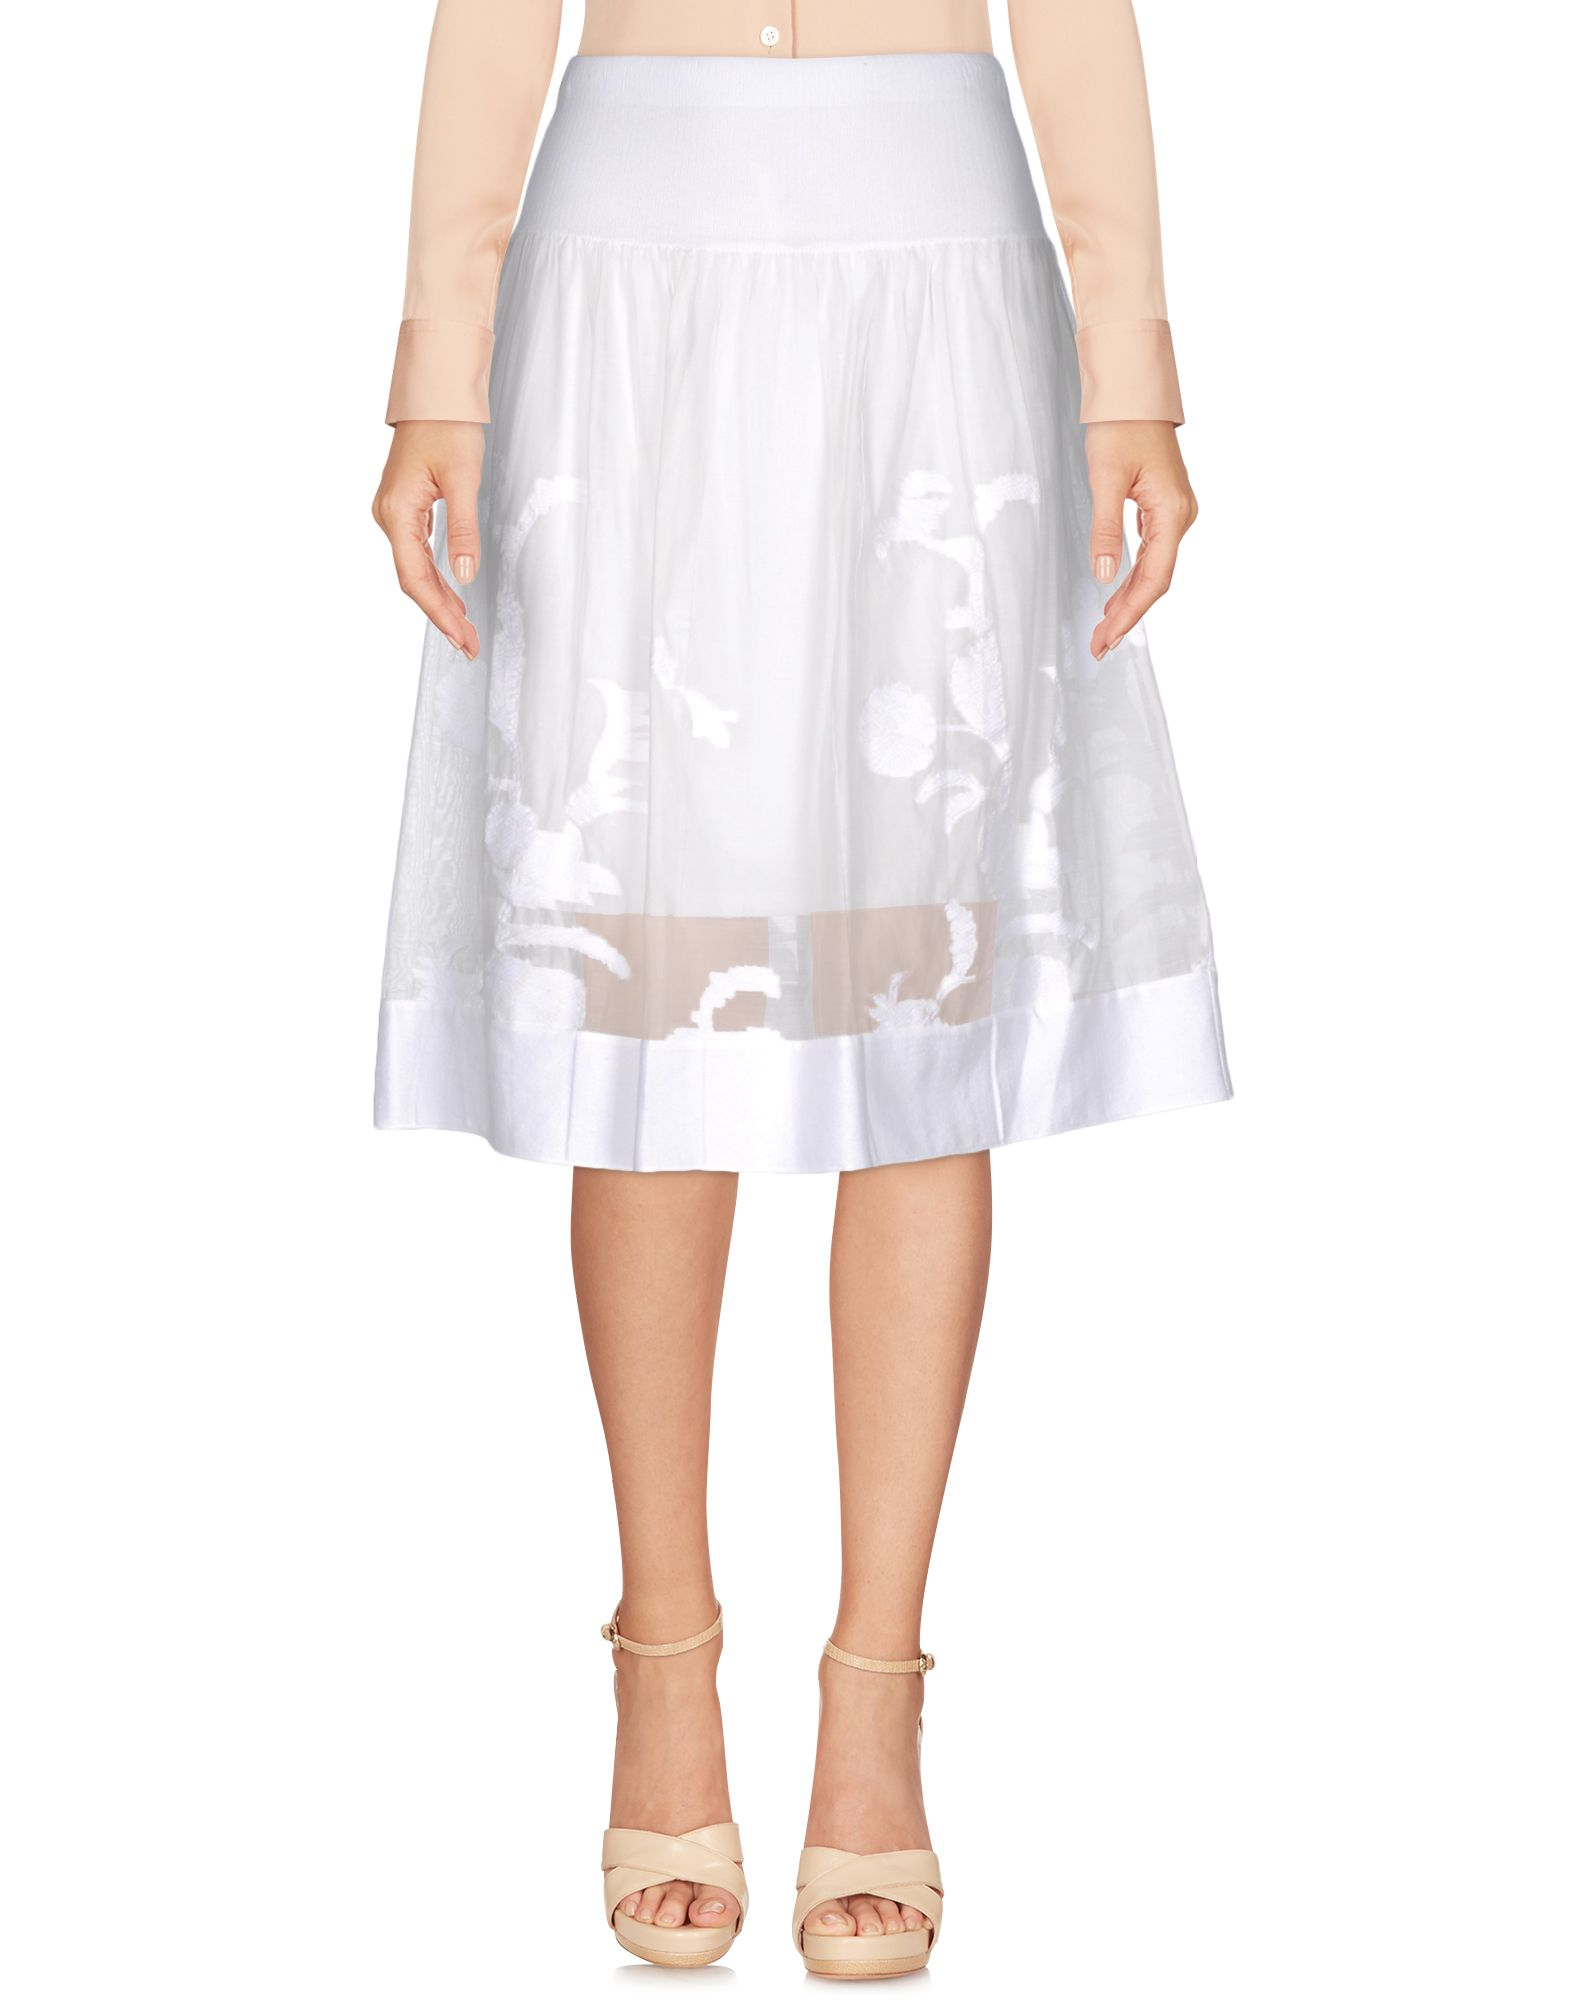 ELIE TAHARI Damen Midirock Farbe Weiß Größe 4